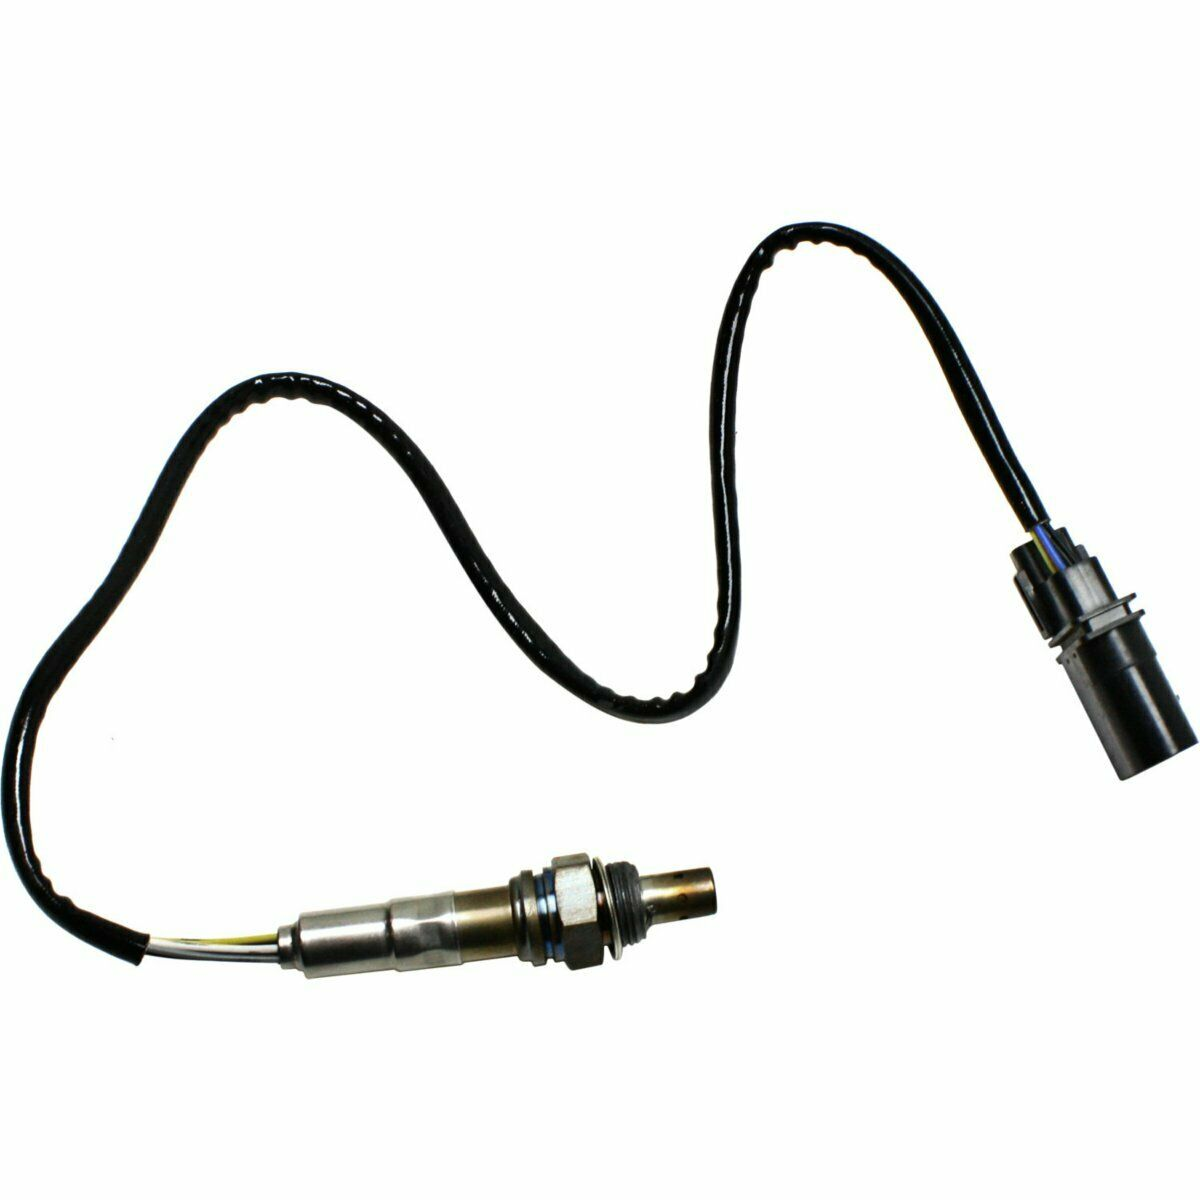 5 Wires O2 Oxygen Sensor Upstream For Kia Forte 2005-2009